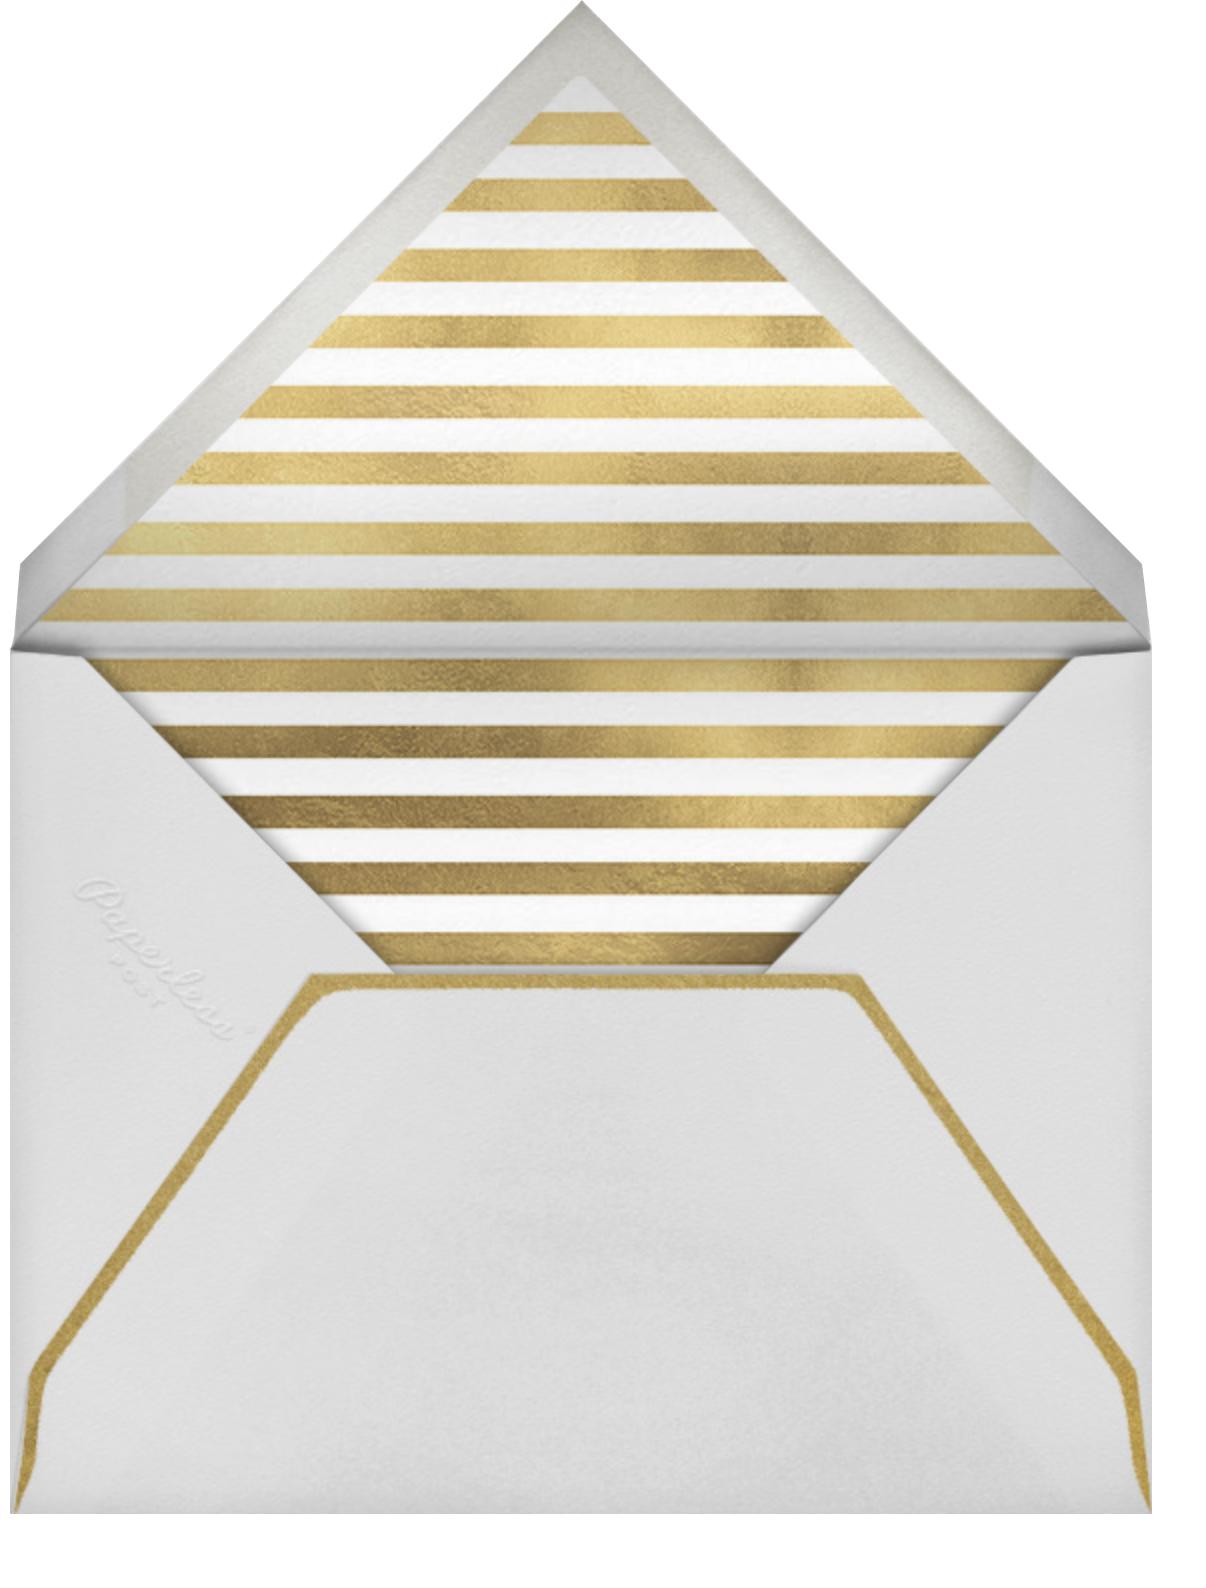 Retrospective - Gold - Paperless Post - Holiday cards - envelope back